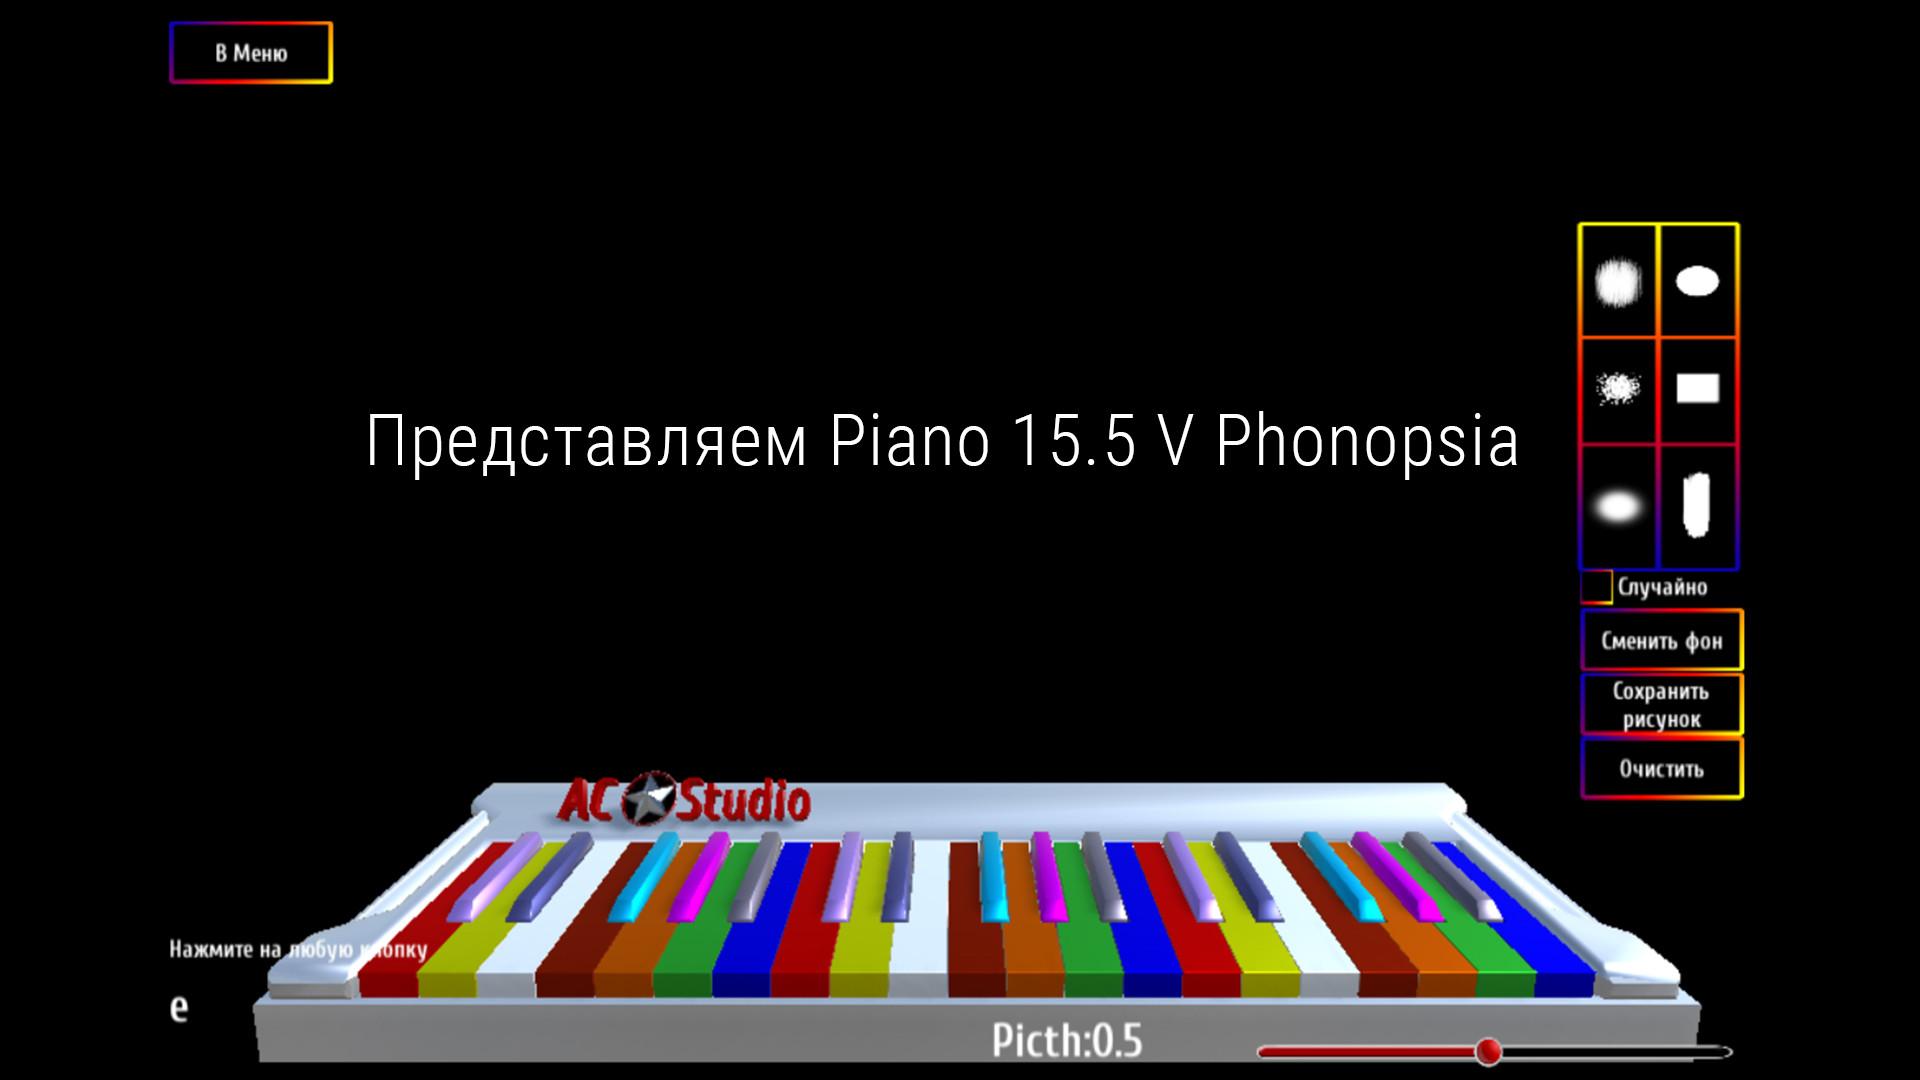 Представляем Piano 15.5 V Phonopsia